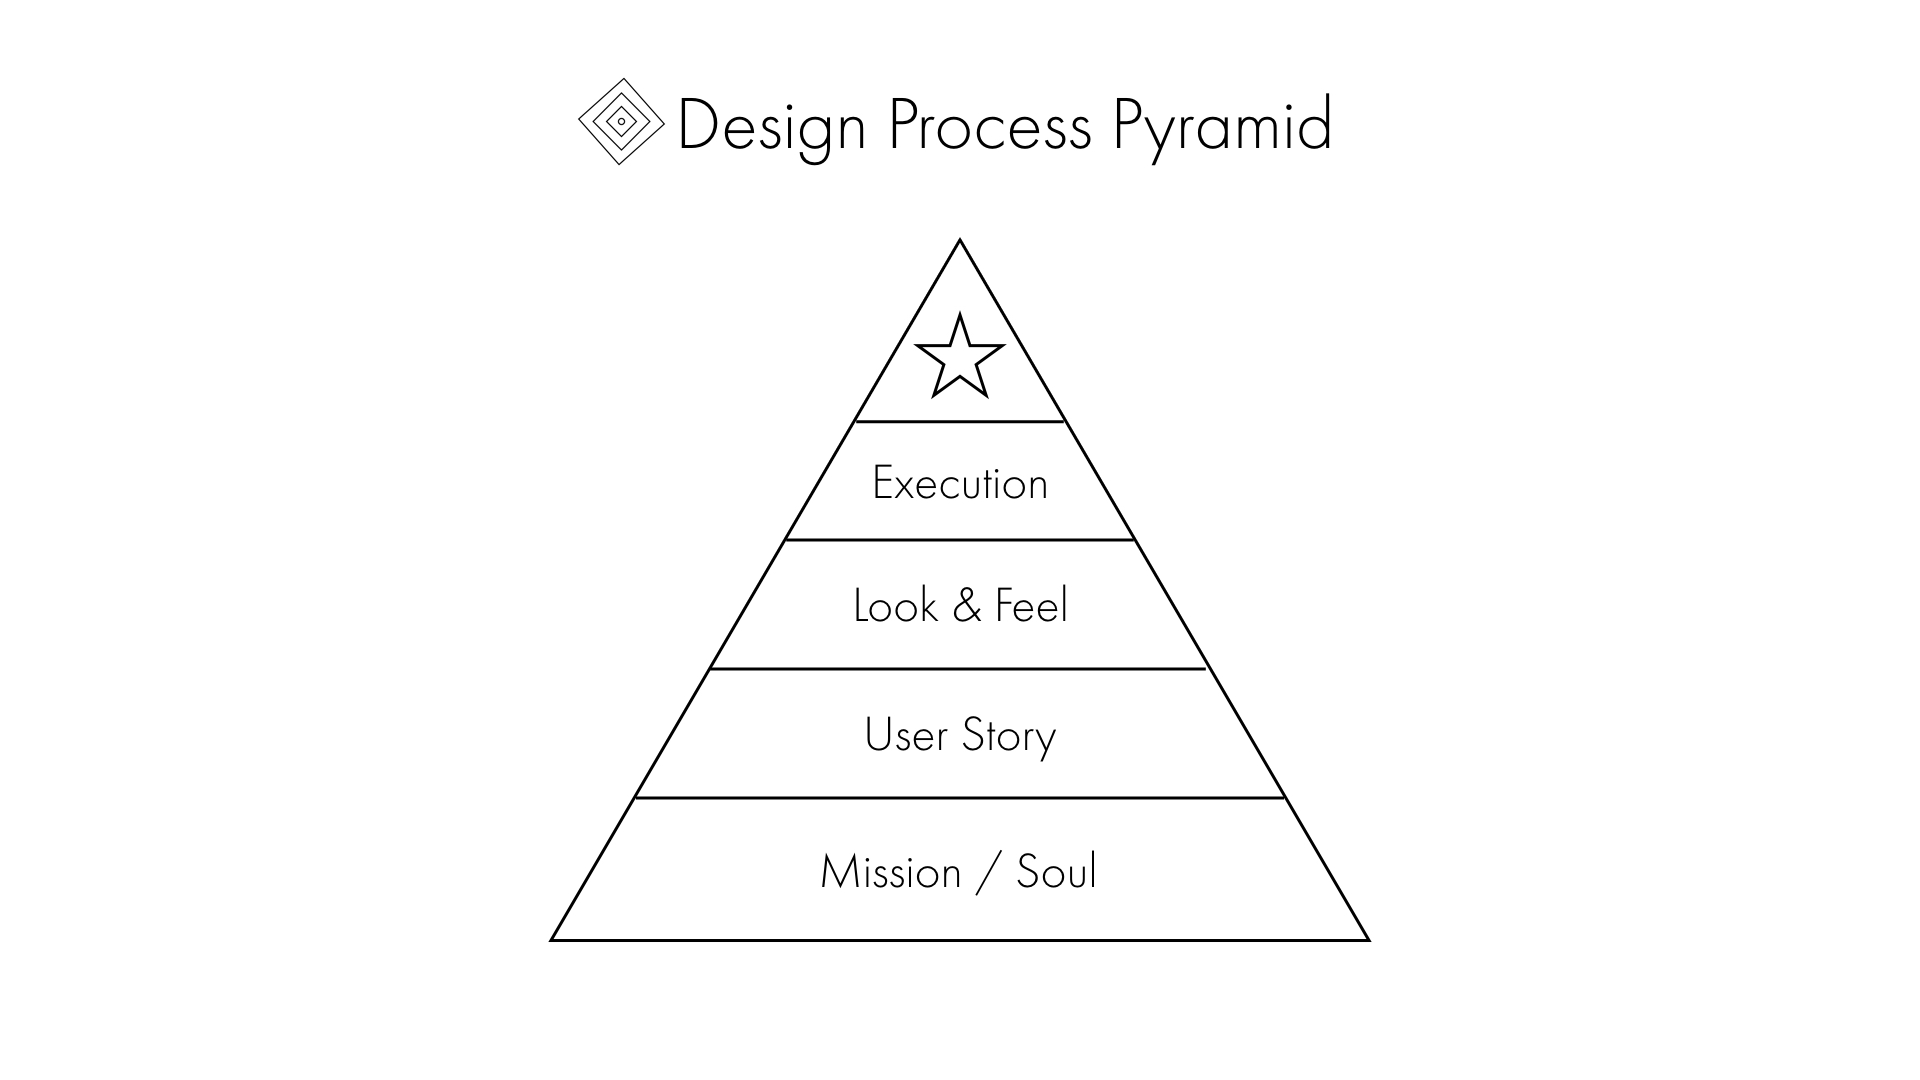 Design Process Pyramid